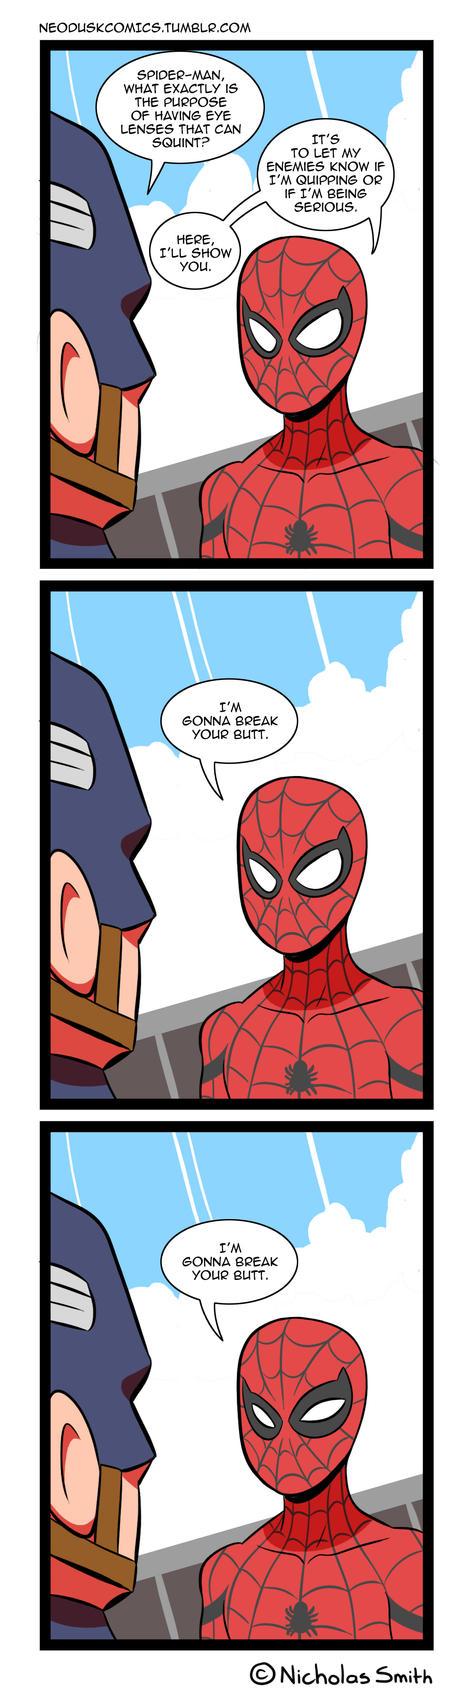 Fandumb #106: Spider-Logical Warfare by Neodusk